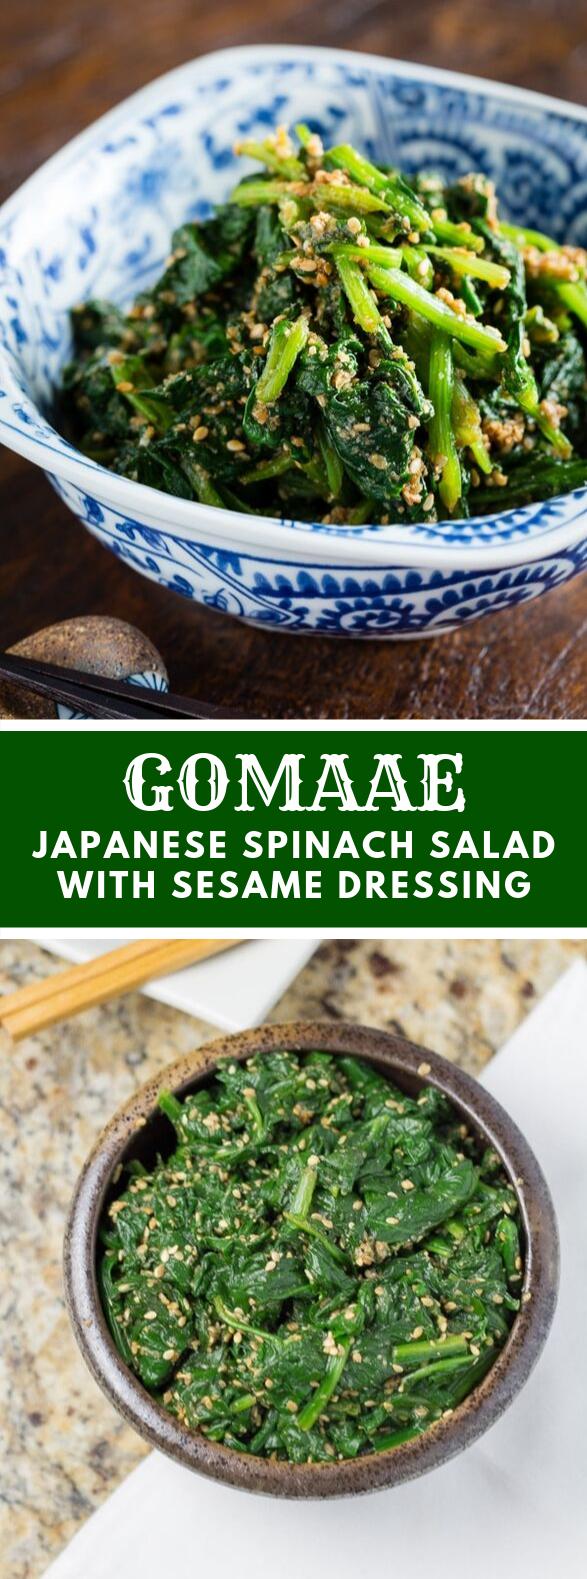 Japanese Spinach Salad with Sesame Dressing (Horenso Gomaae) ほうれん草の胡麻和え #vegetarian #healthy